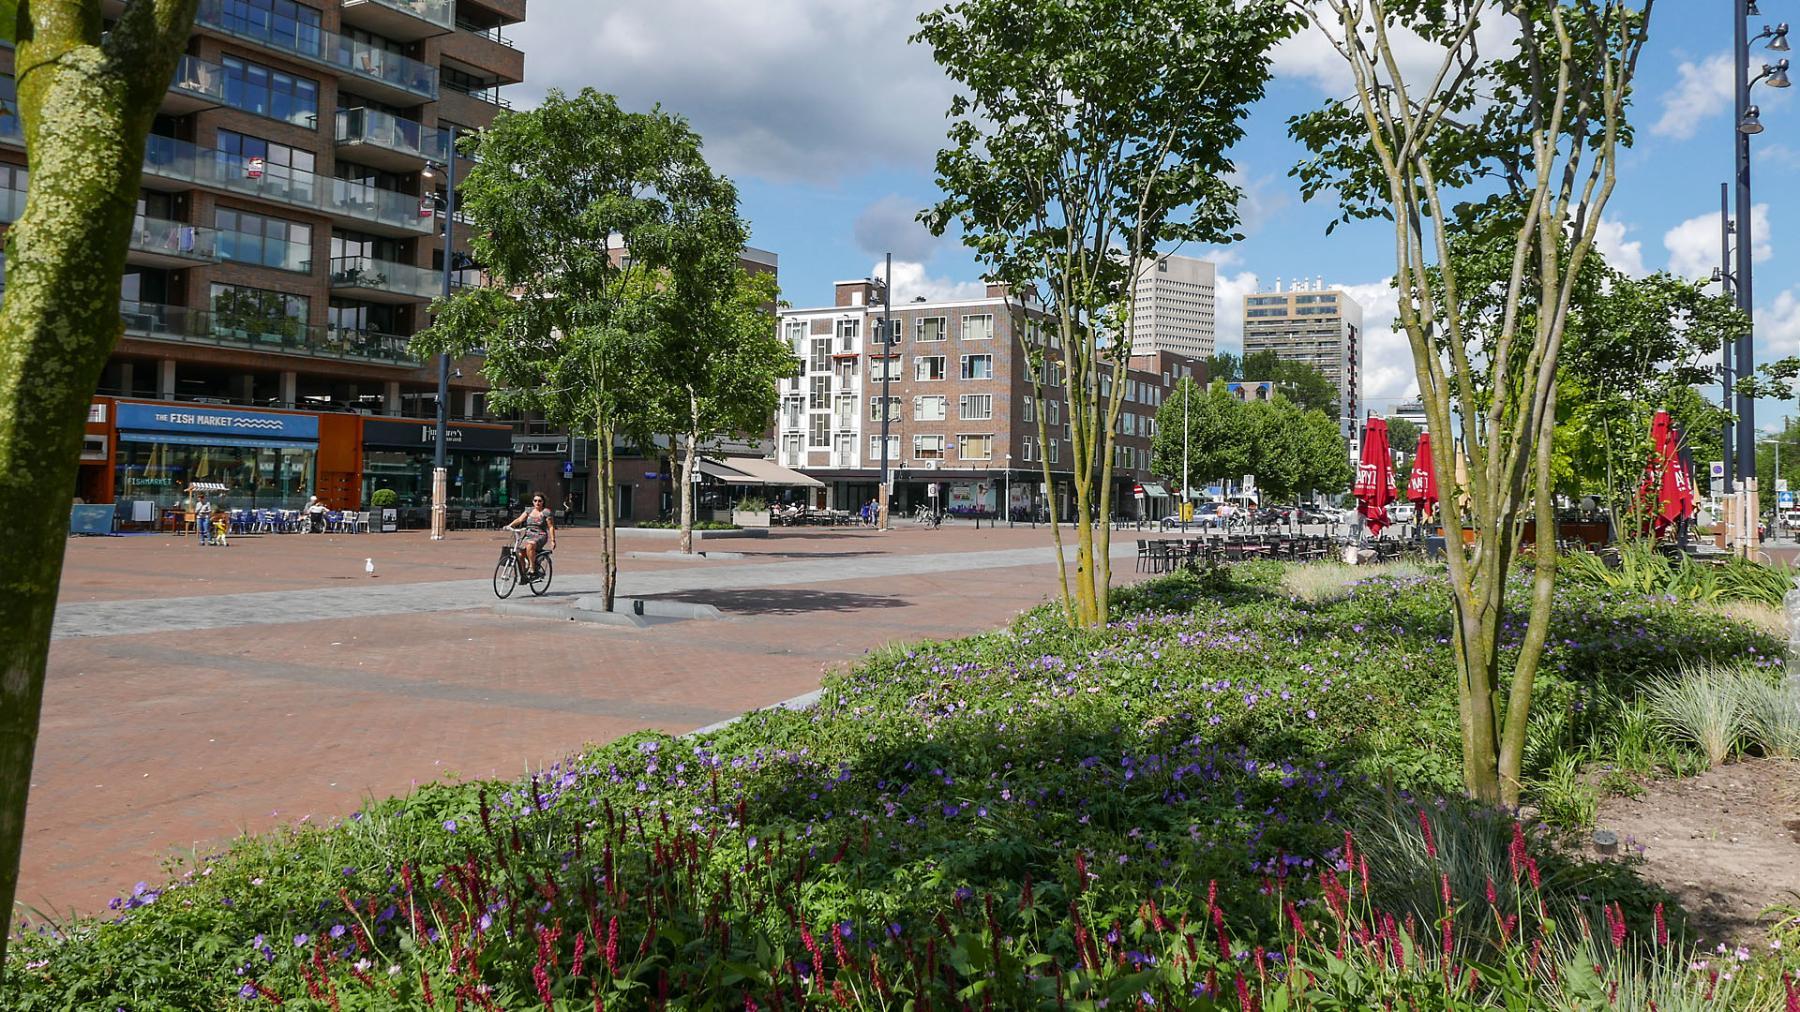 De Binnenrotte in Rotterdam is bekroond tot beste openbare ruimte. FOTO Gemeente Rotterdam